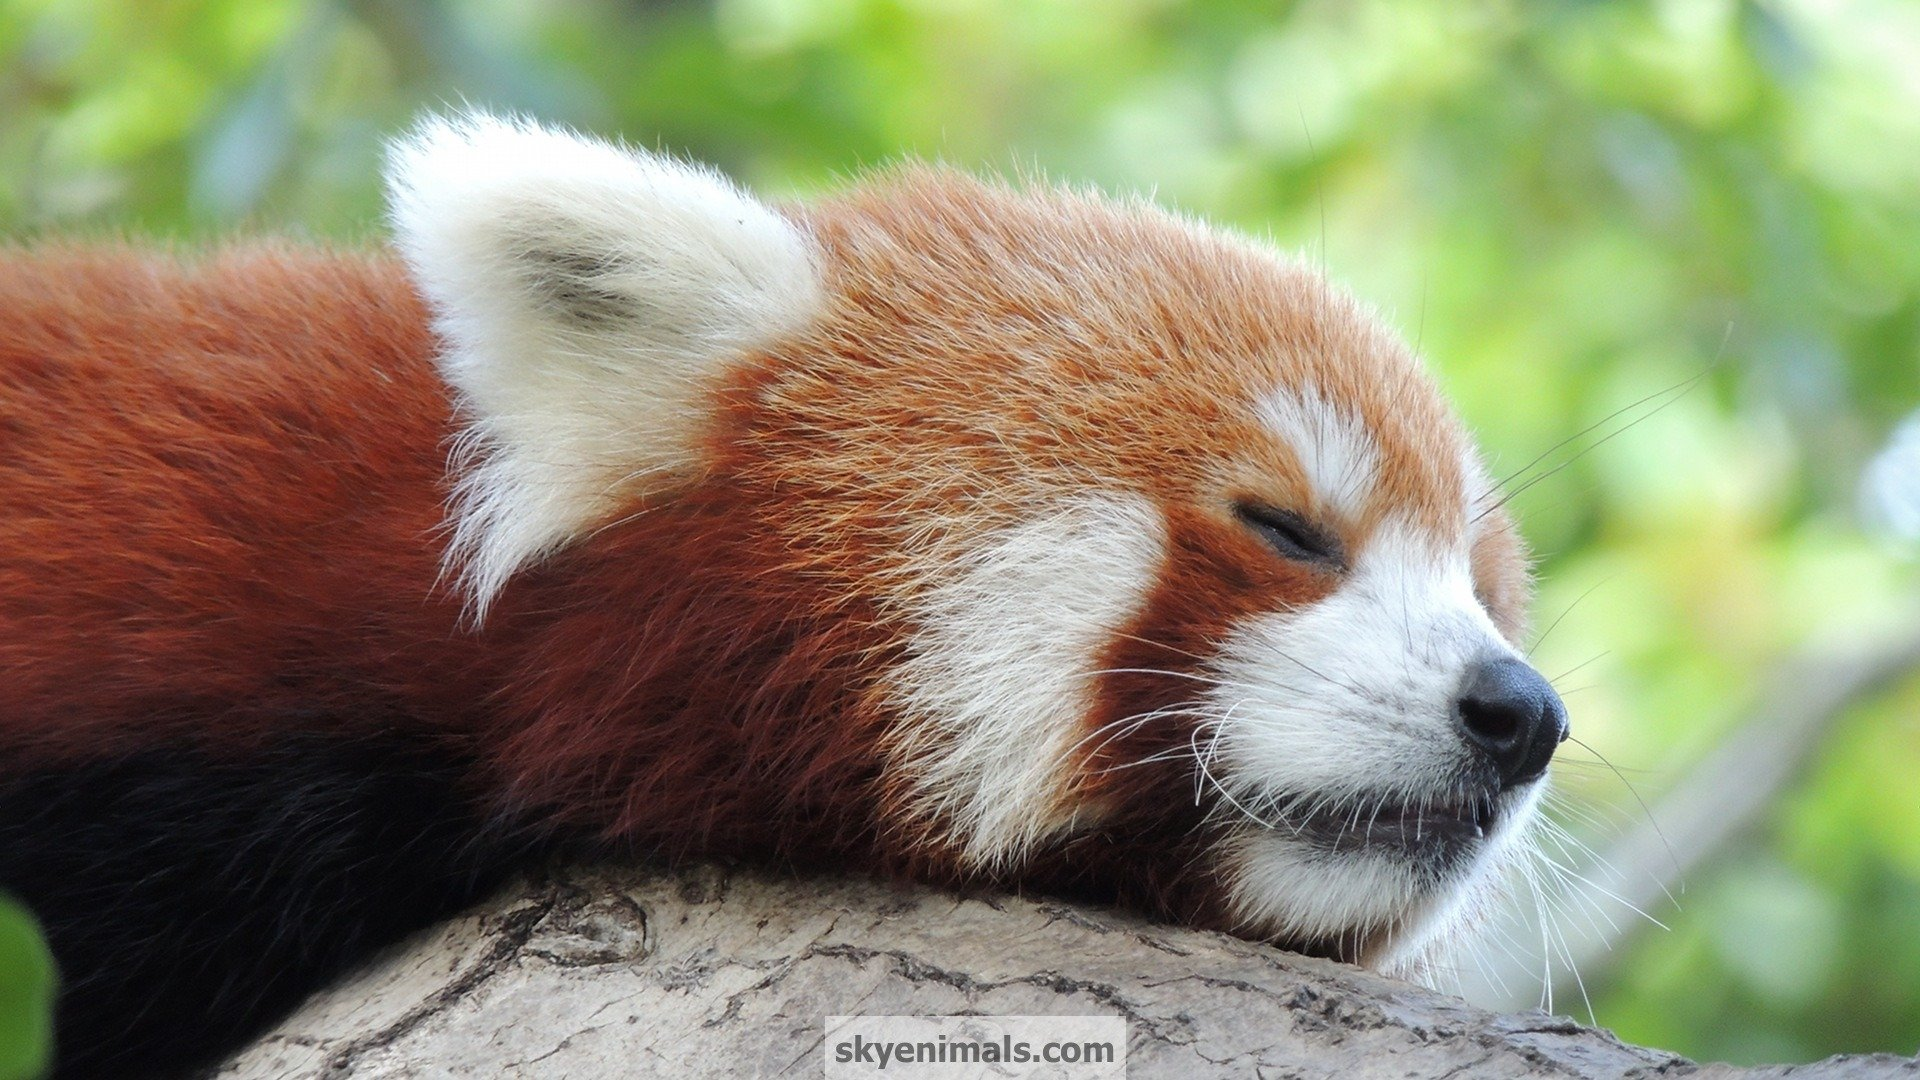 Cute Red Panda Wallpaper - WallpaperSafari | 1920 x 1080 jpeg 496kB